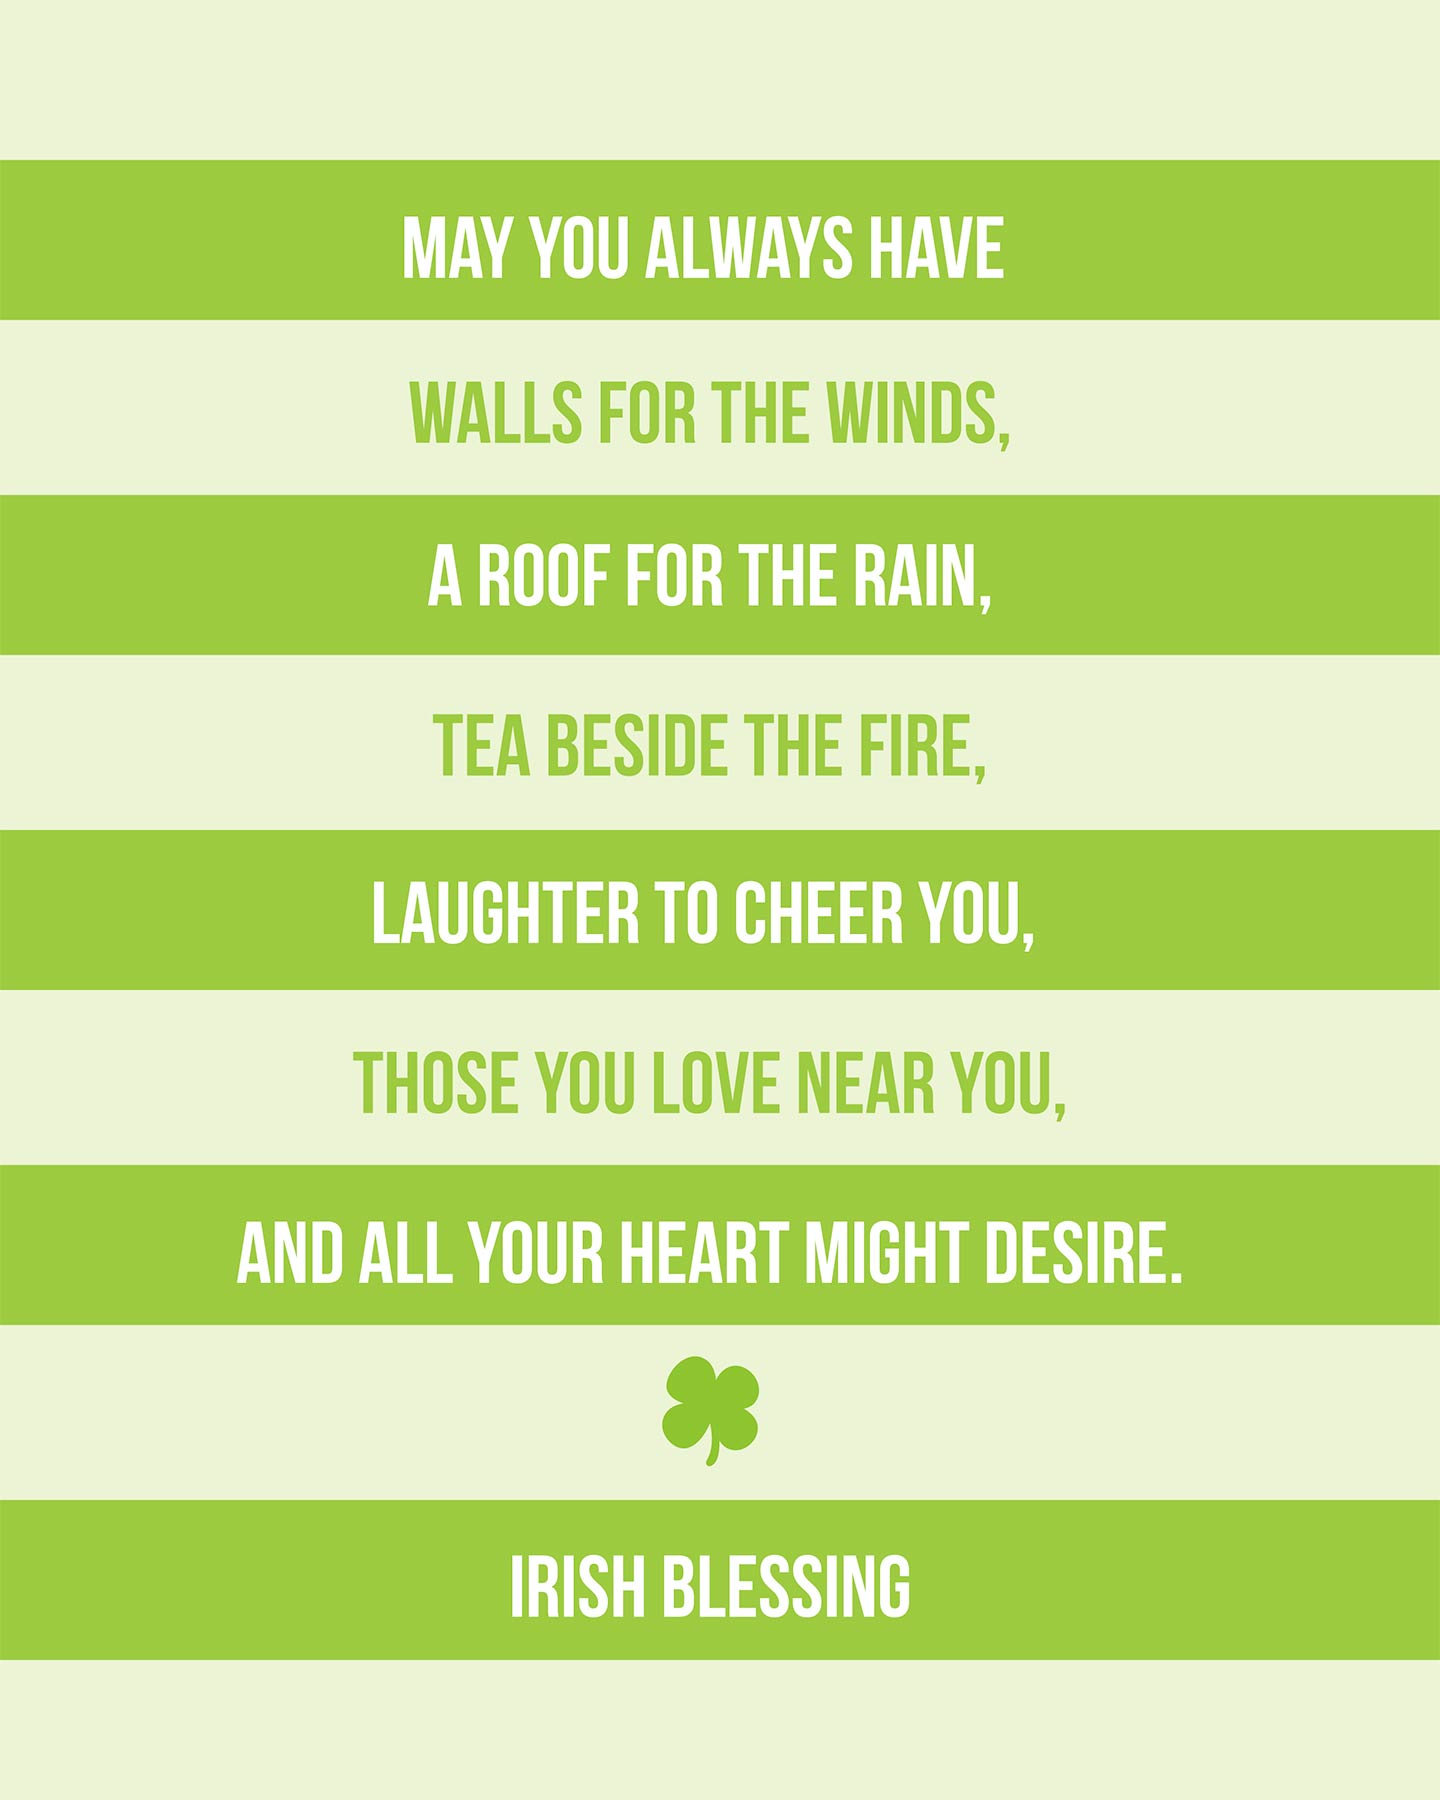 St. Patrick's Day Irish Blessing Printable.